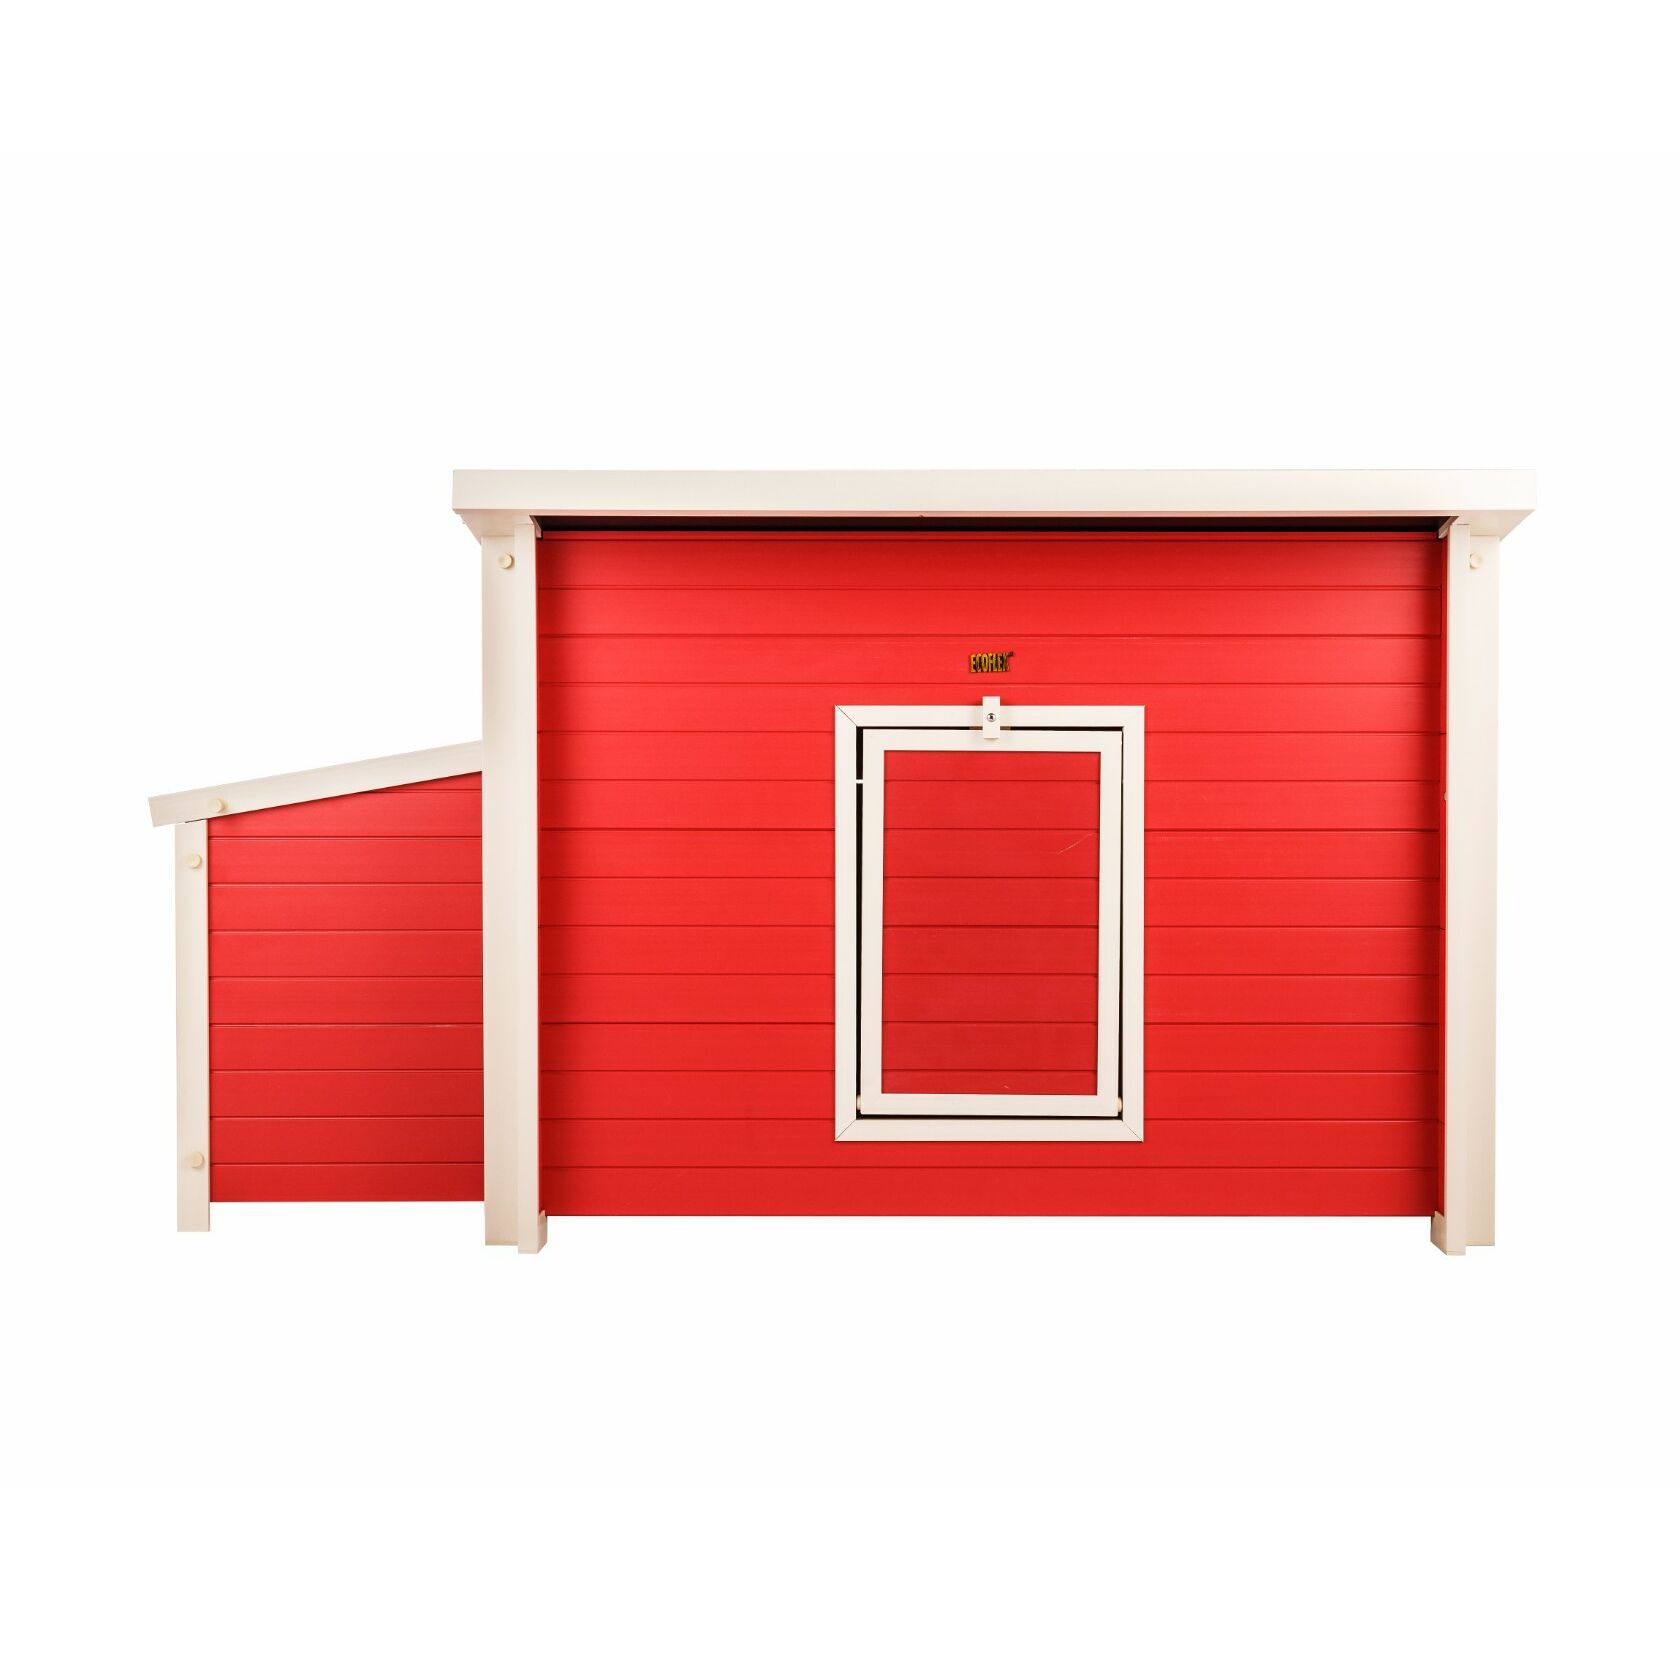 Achilles ecoFLEX Chicken Barn Color: Red